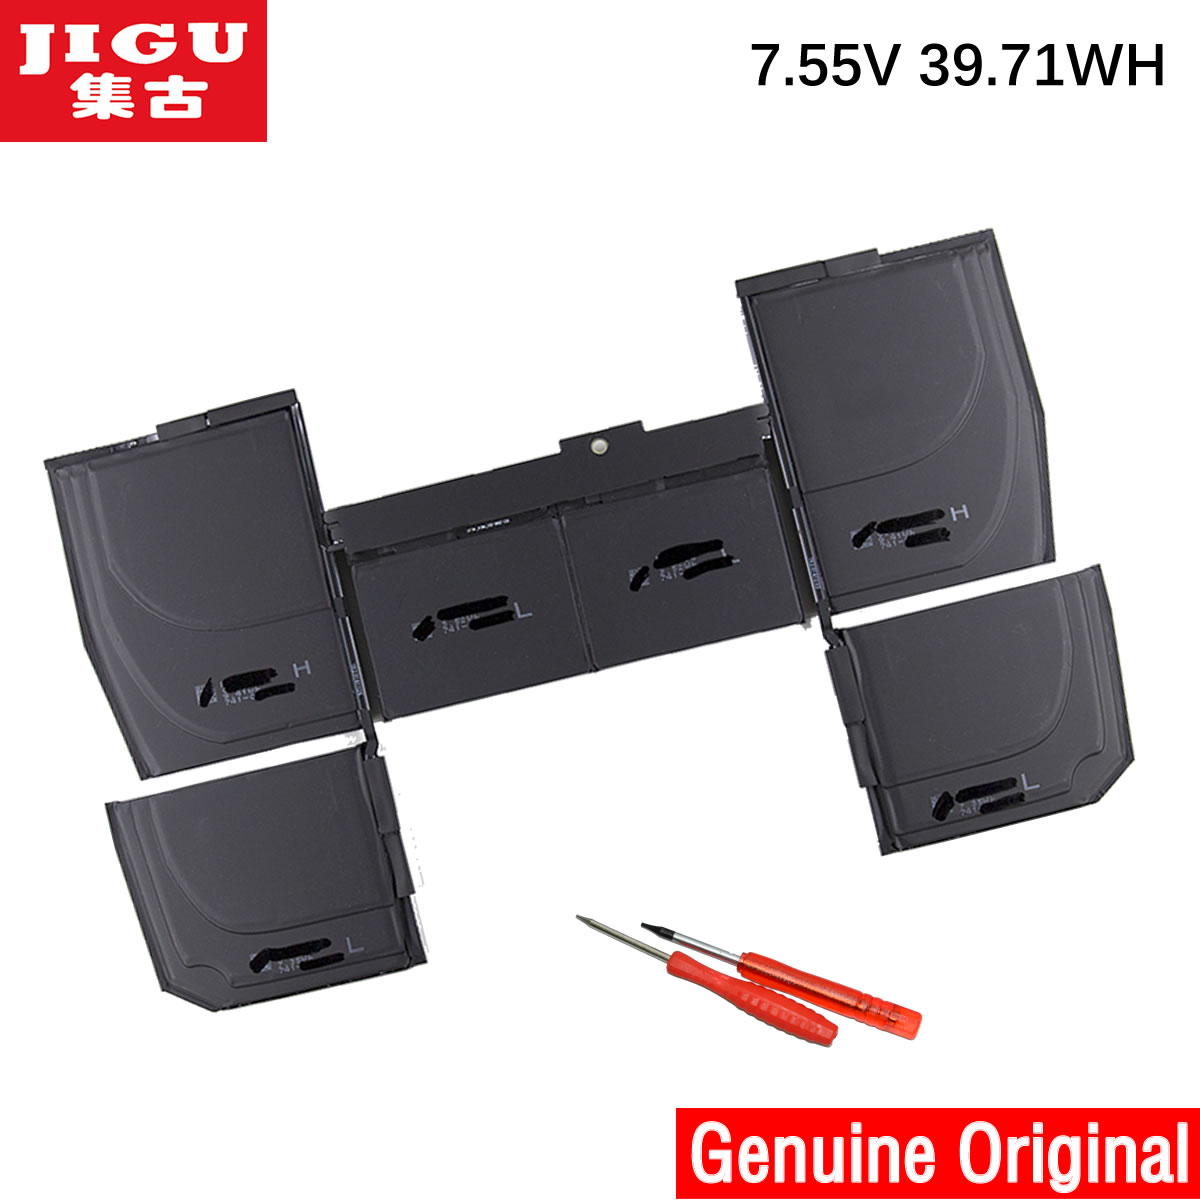 все цены на JIGU A1527 Original Laptop Battery For APPLE MacBook 12